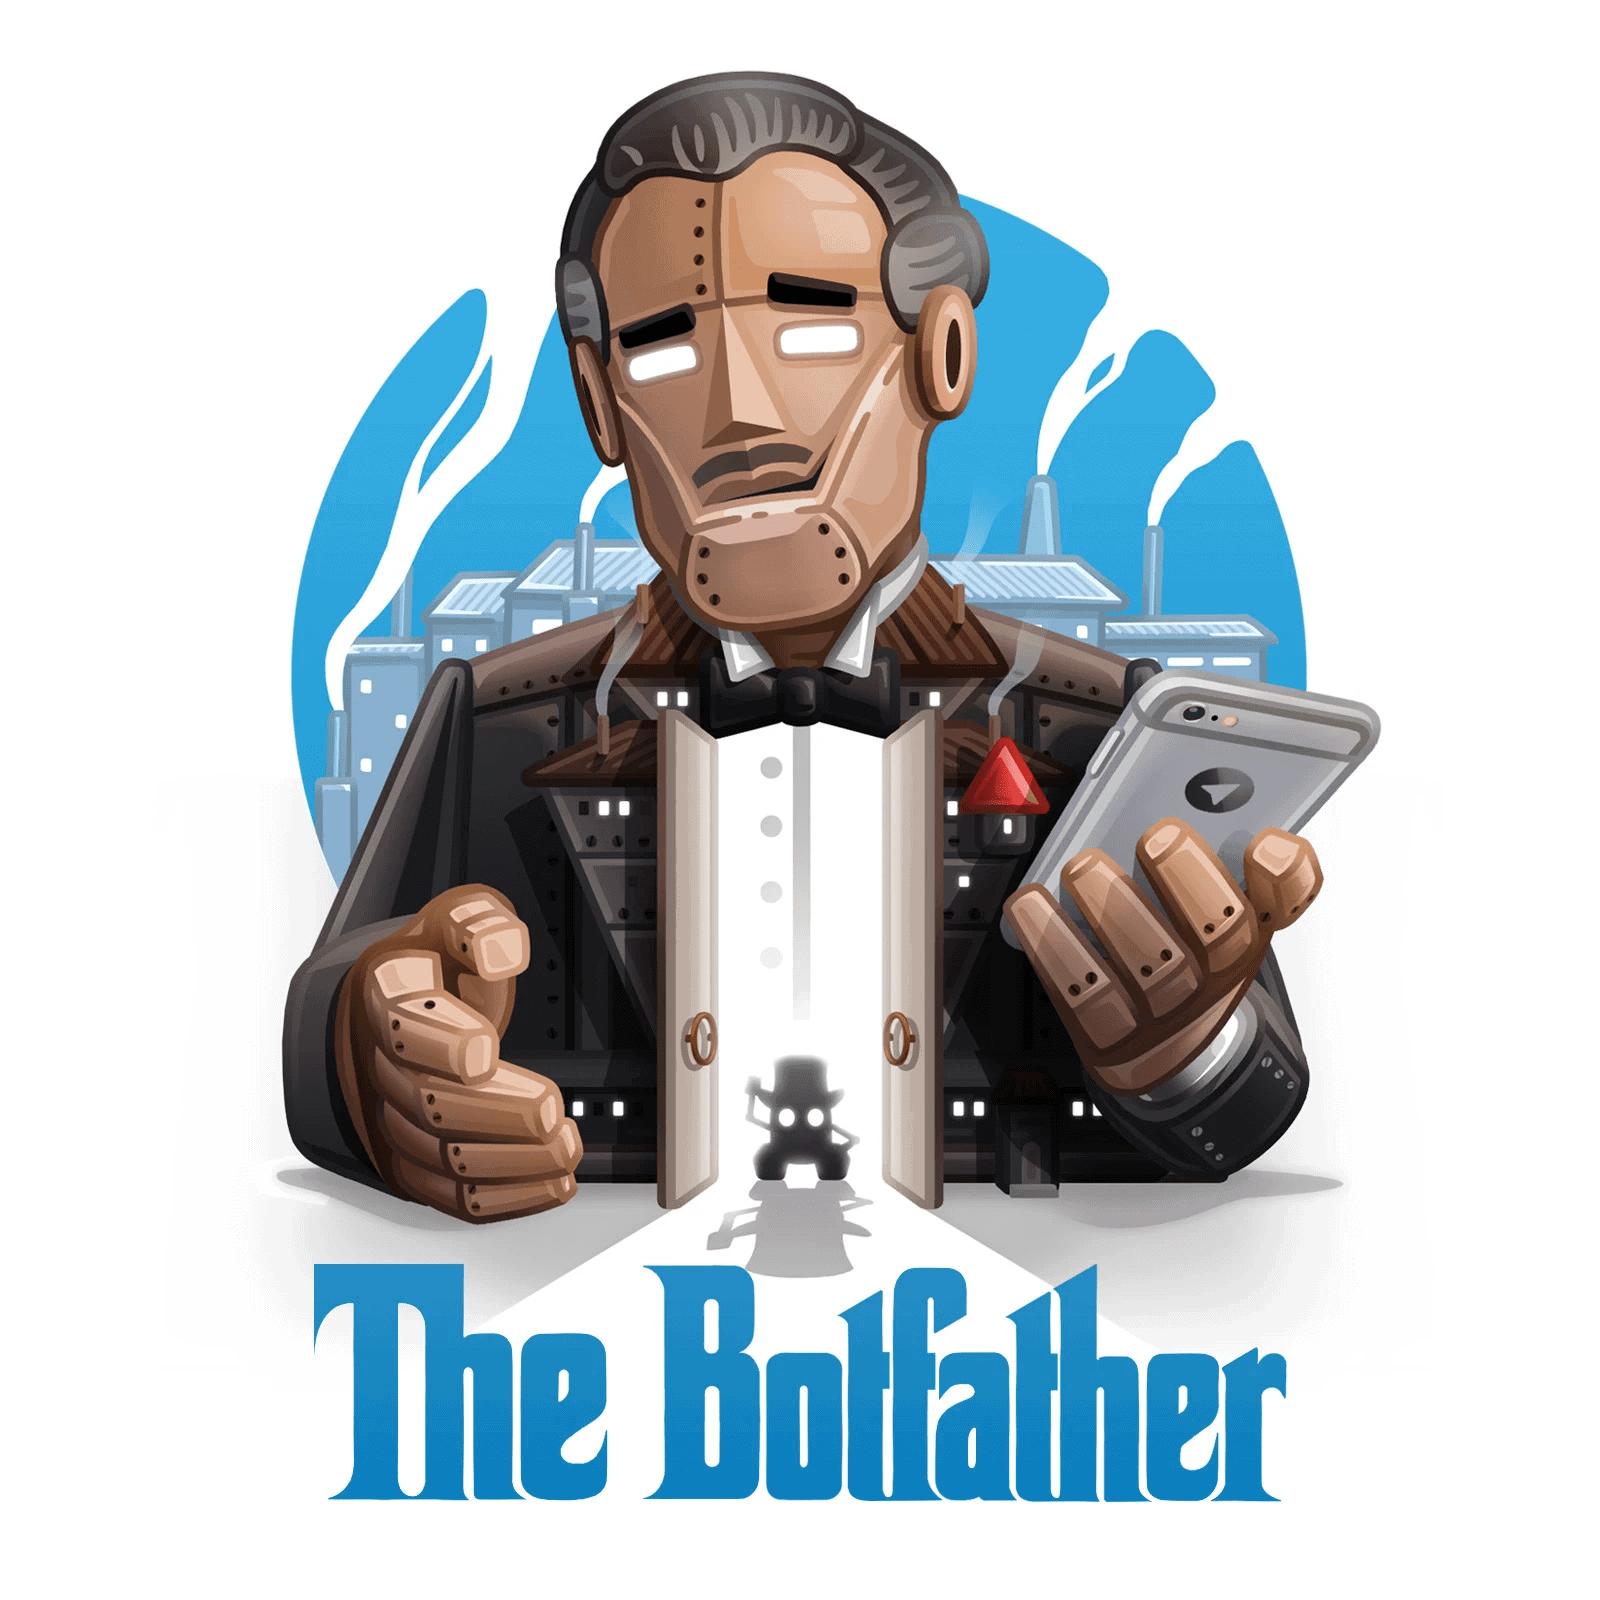 Telegram Bot Father